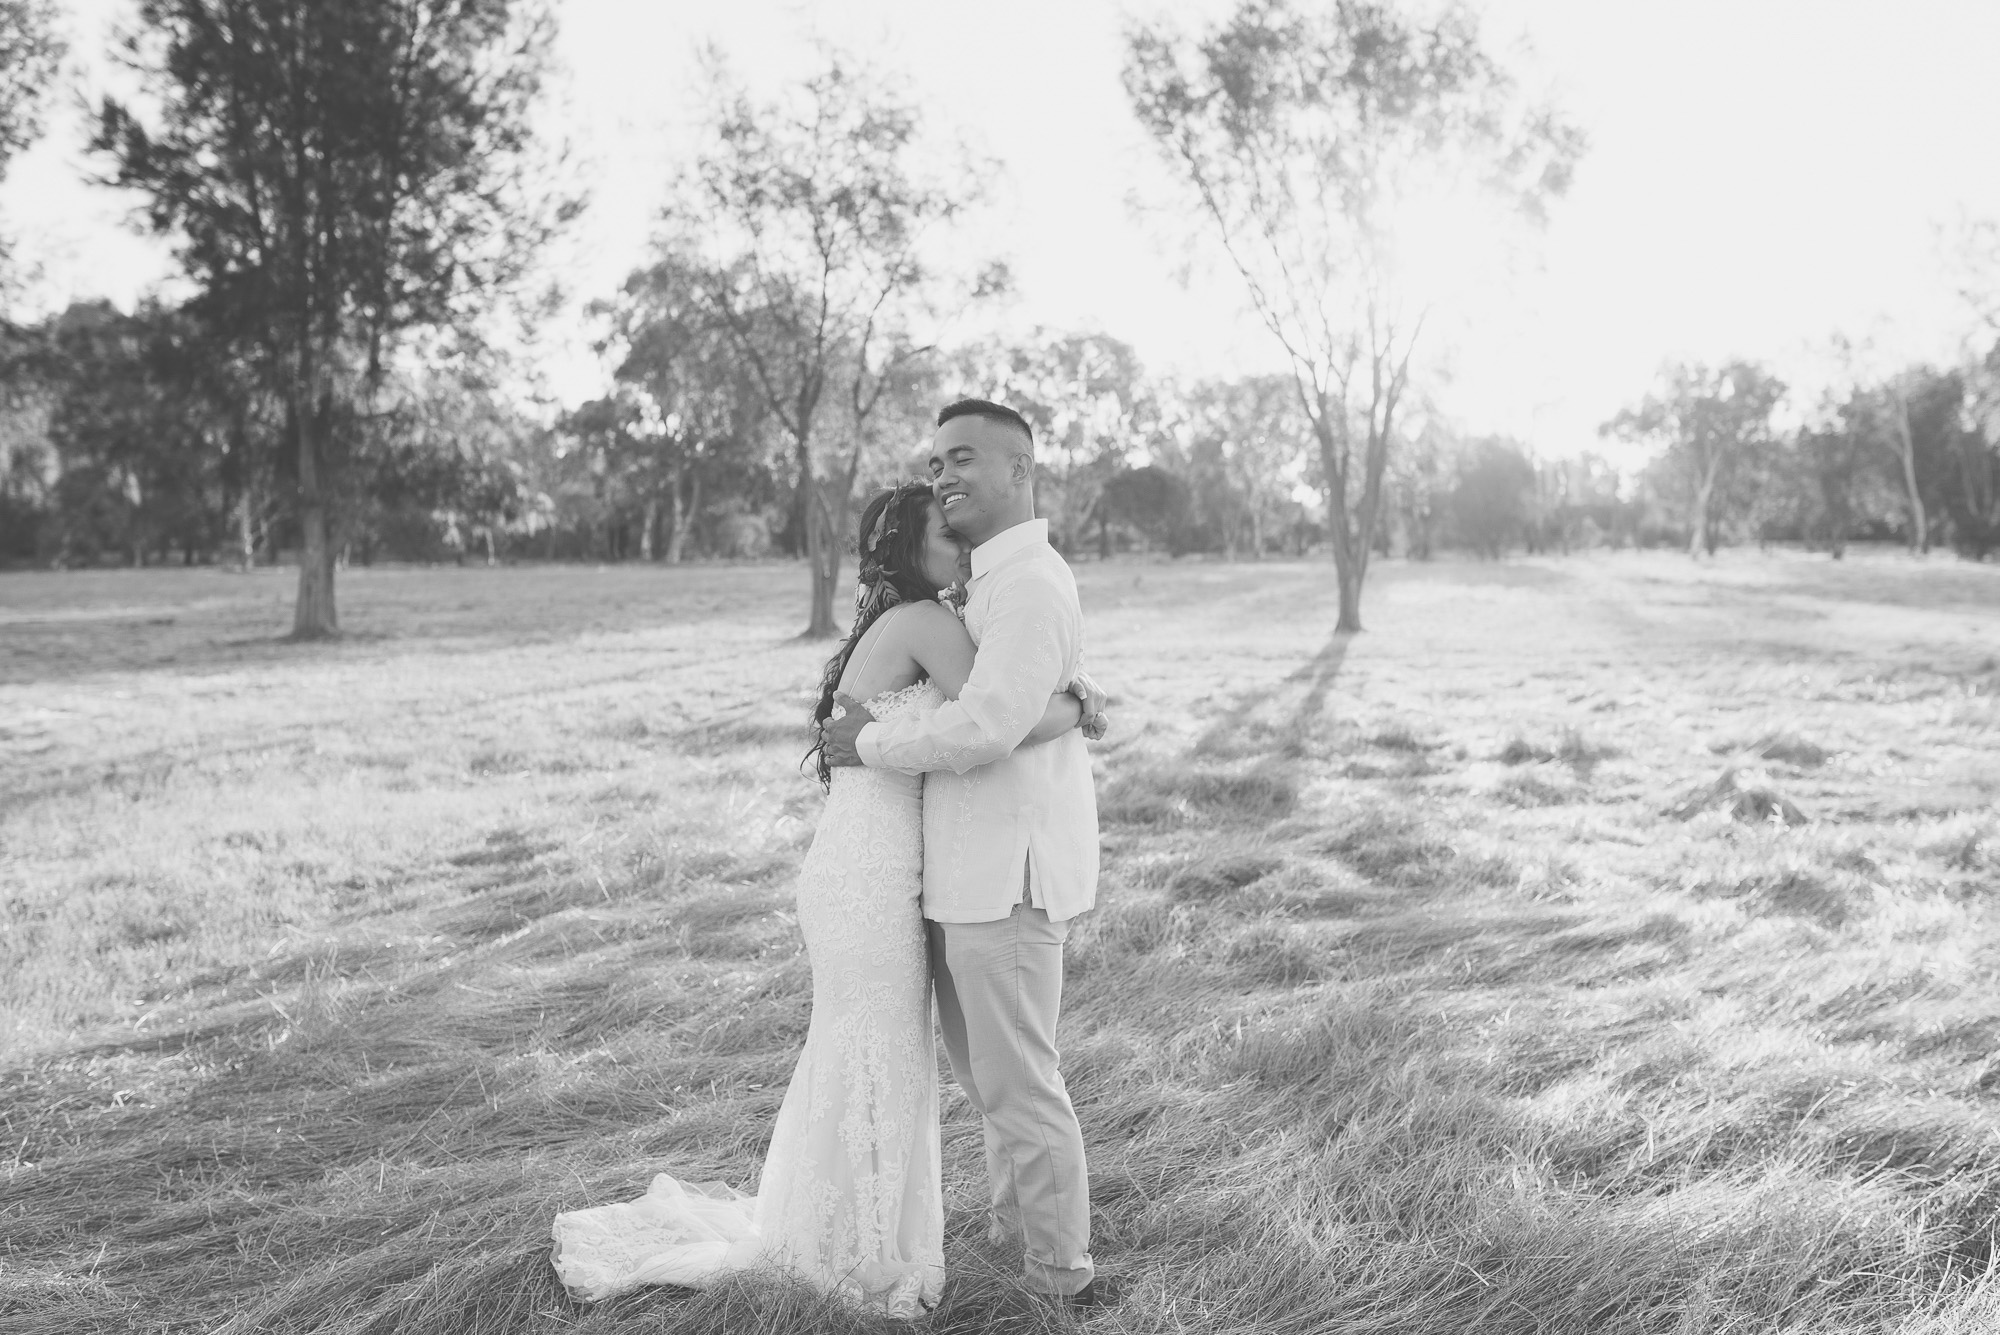 wedding-photographer-outdoor-casual-styled-los-angeles-australia-california-international-earthbound -64.jpg